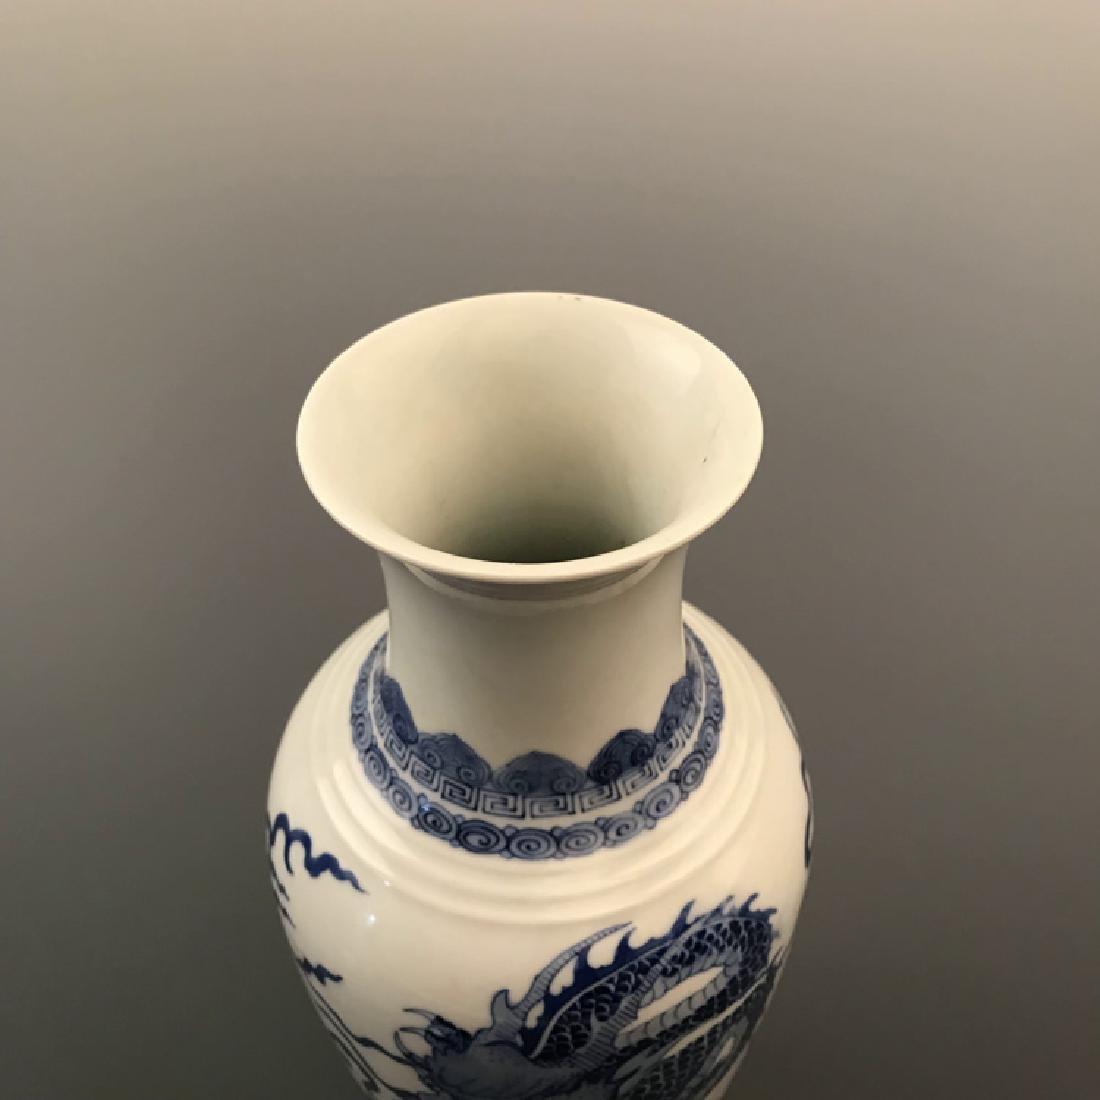 Chinese Blue and white Dragon Vase with Kangxi Mark - 3